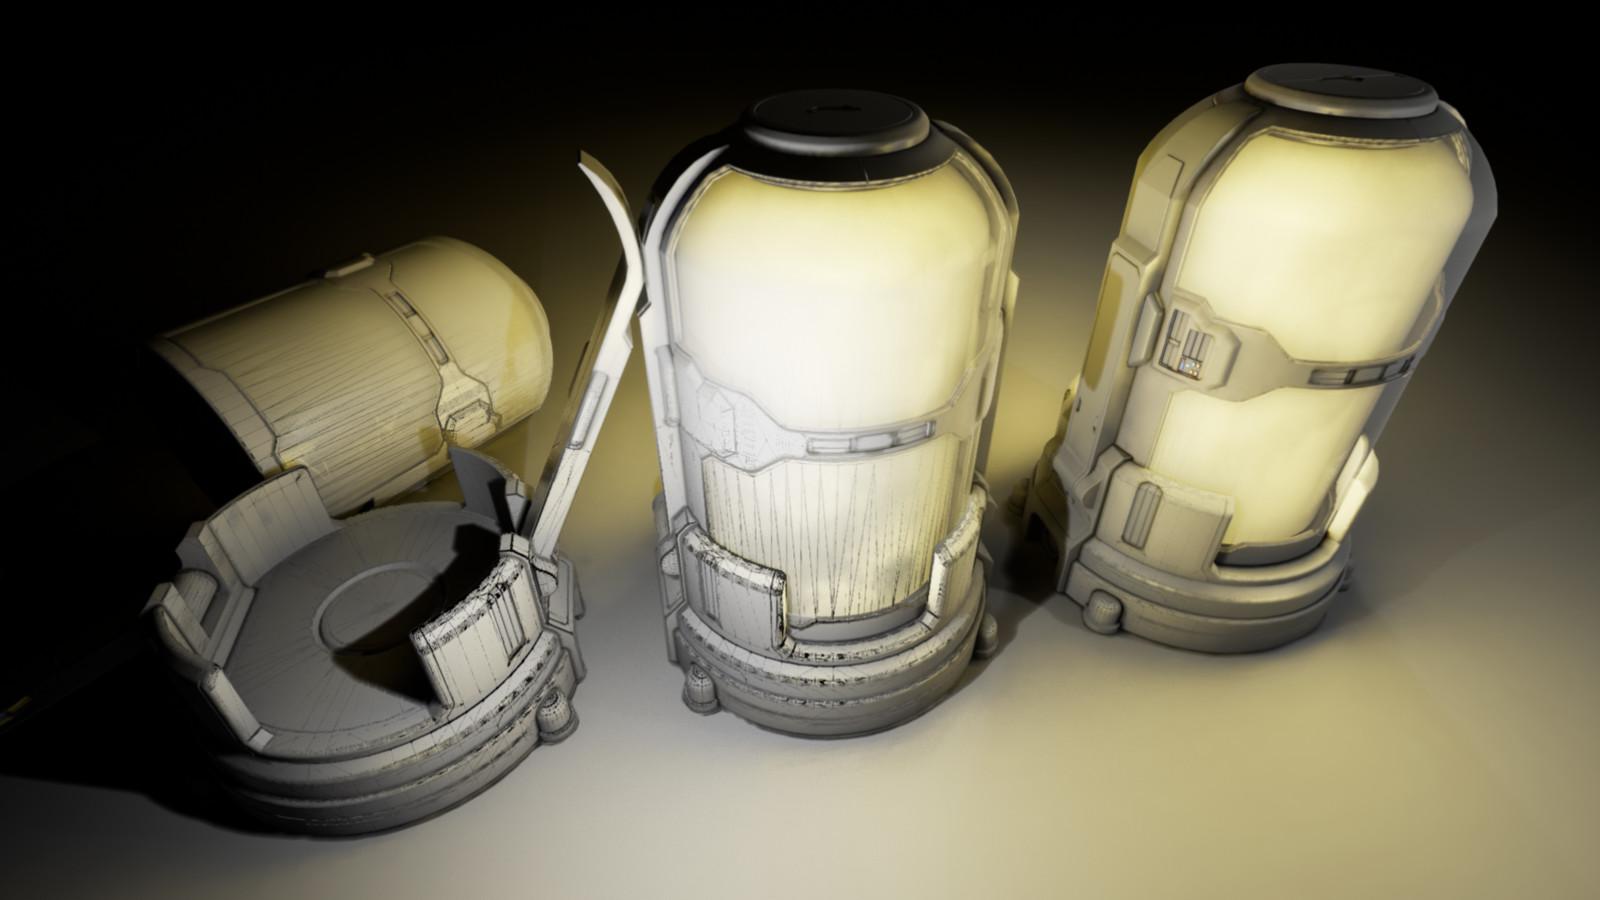 Simple lighting plus UVs